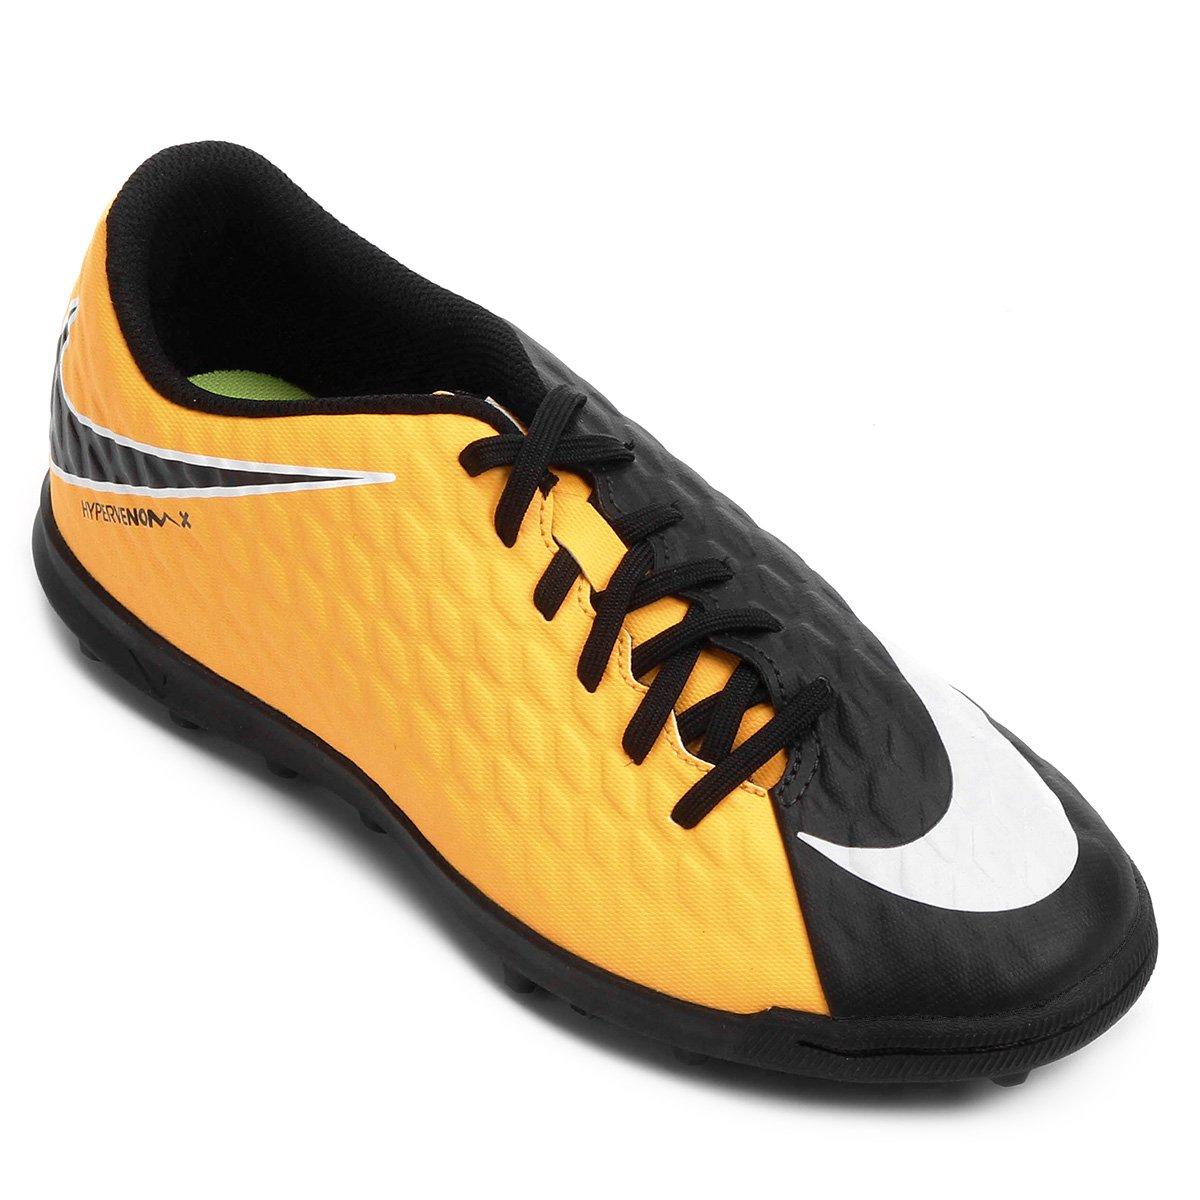 Chuteira Society Nike Hypervenom Phade 3 - Laranja e Preto - Compre ... f493ed572e1f2